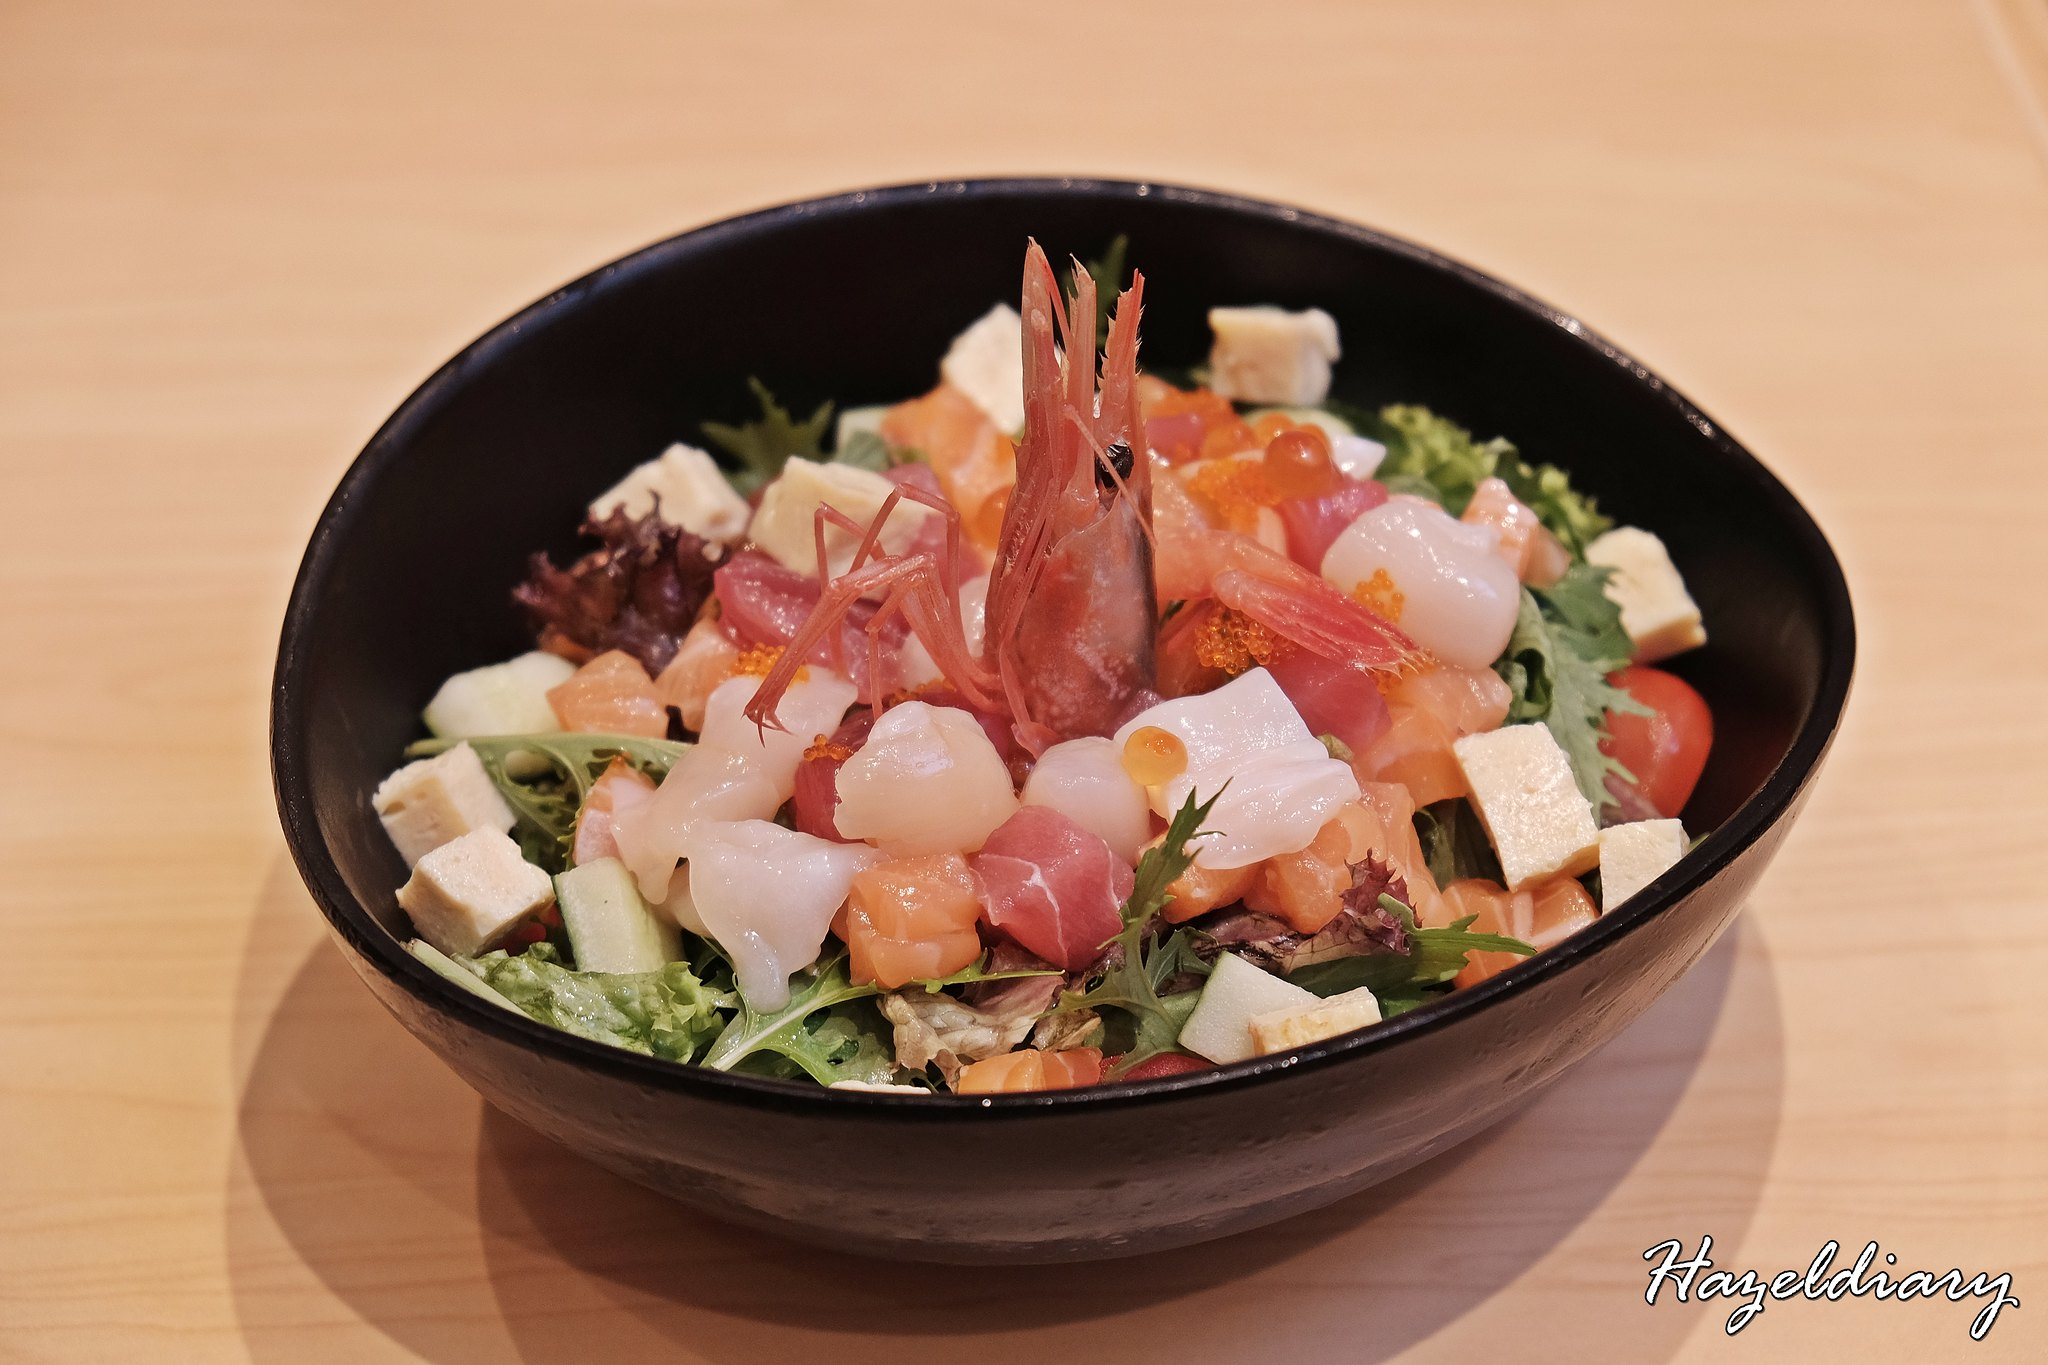 Hokkaido-Ya-bara chirashi Salad